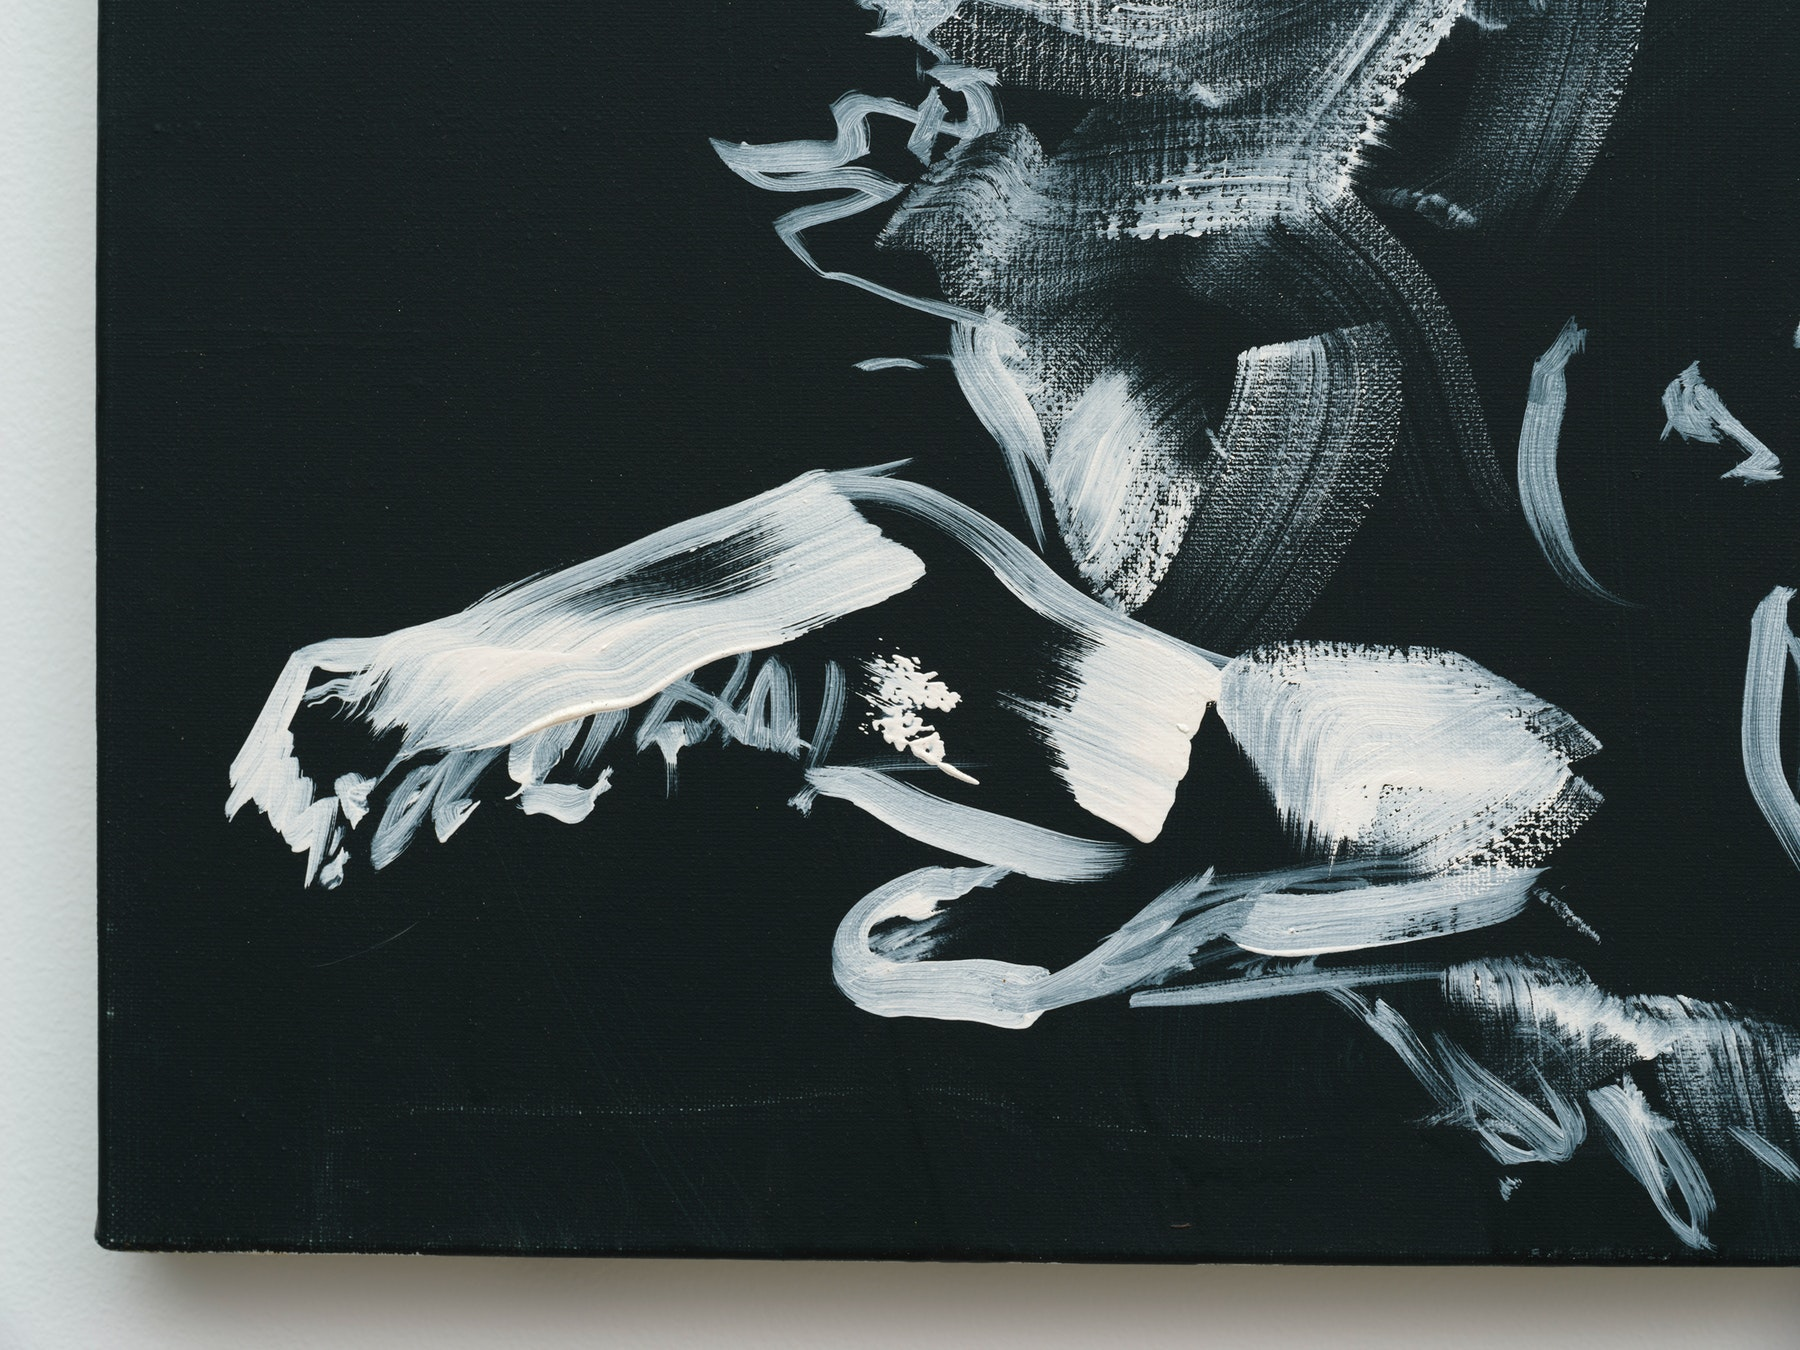 "Monique Van Genderen ""Nightime Lou,"" 2019 Oil on linen 20"" x 16"" [HxW] (50.8 x 40.64 cm) Inventory #VGE414 Courtesy of the artist and Vielmetter Los Angeles Photo credit: Jeff McLane"